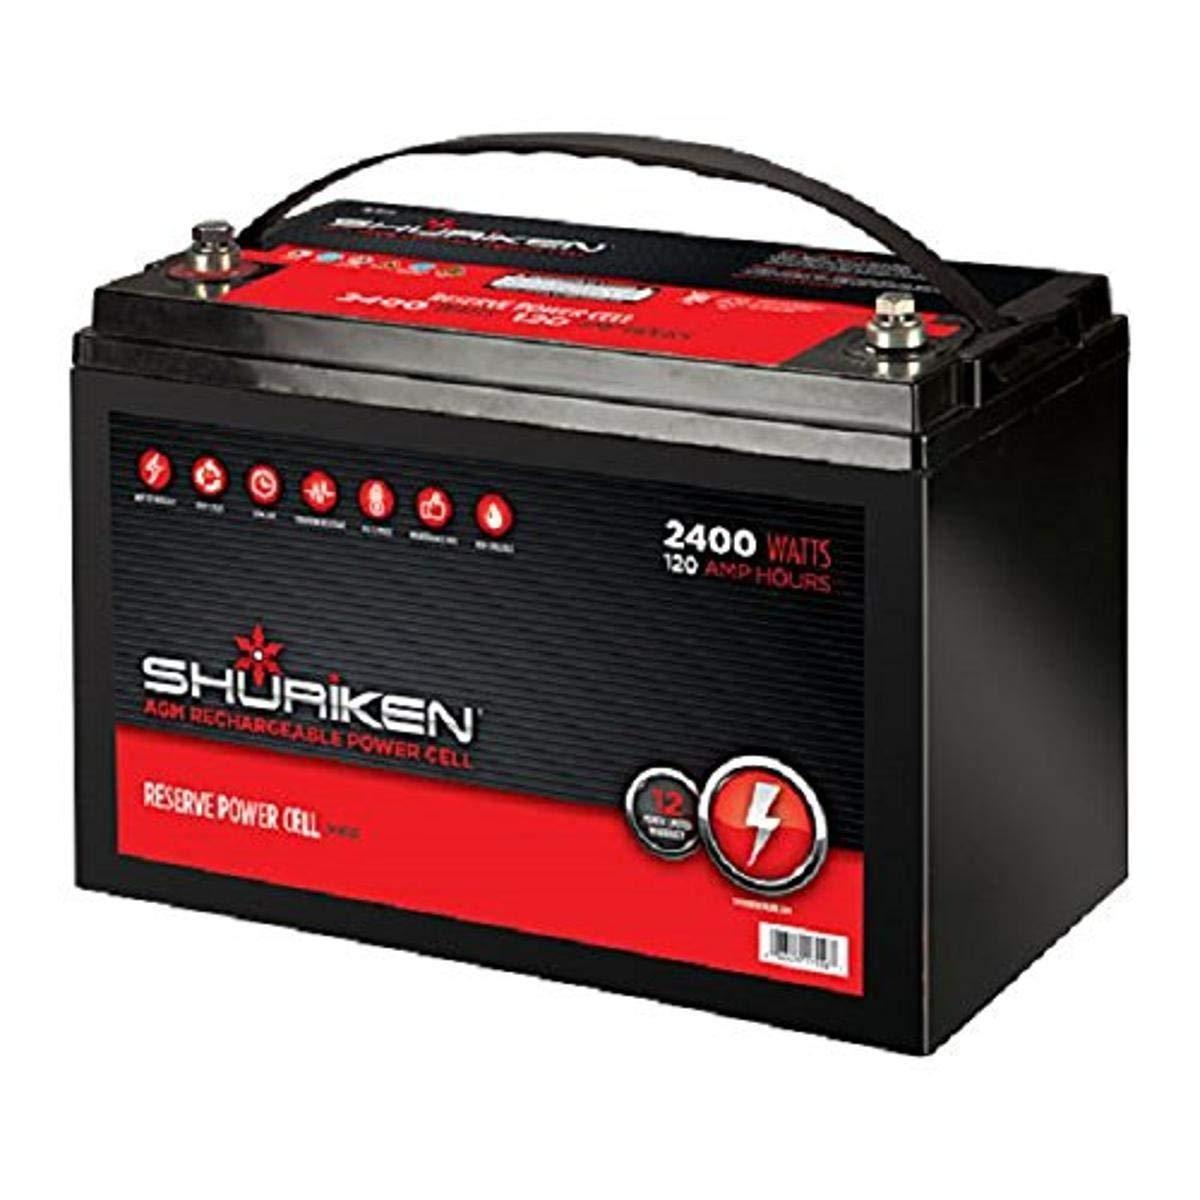 SHURIKEN 2400W 120AMP Hours Large Size AGM 12V Battery